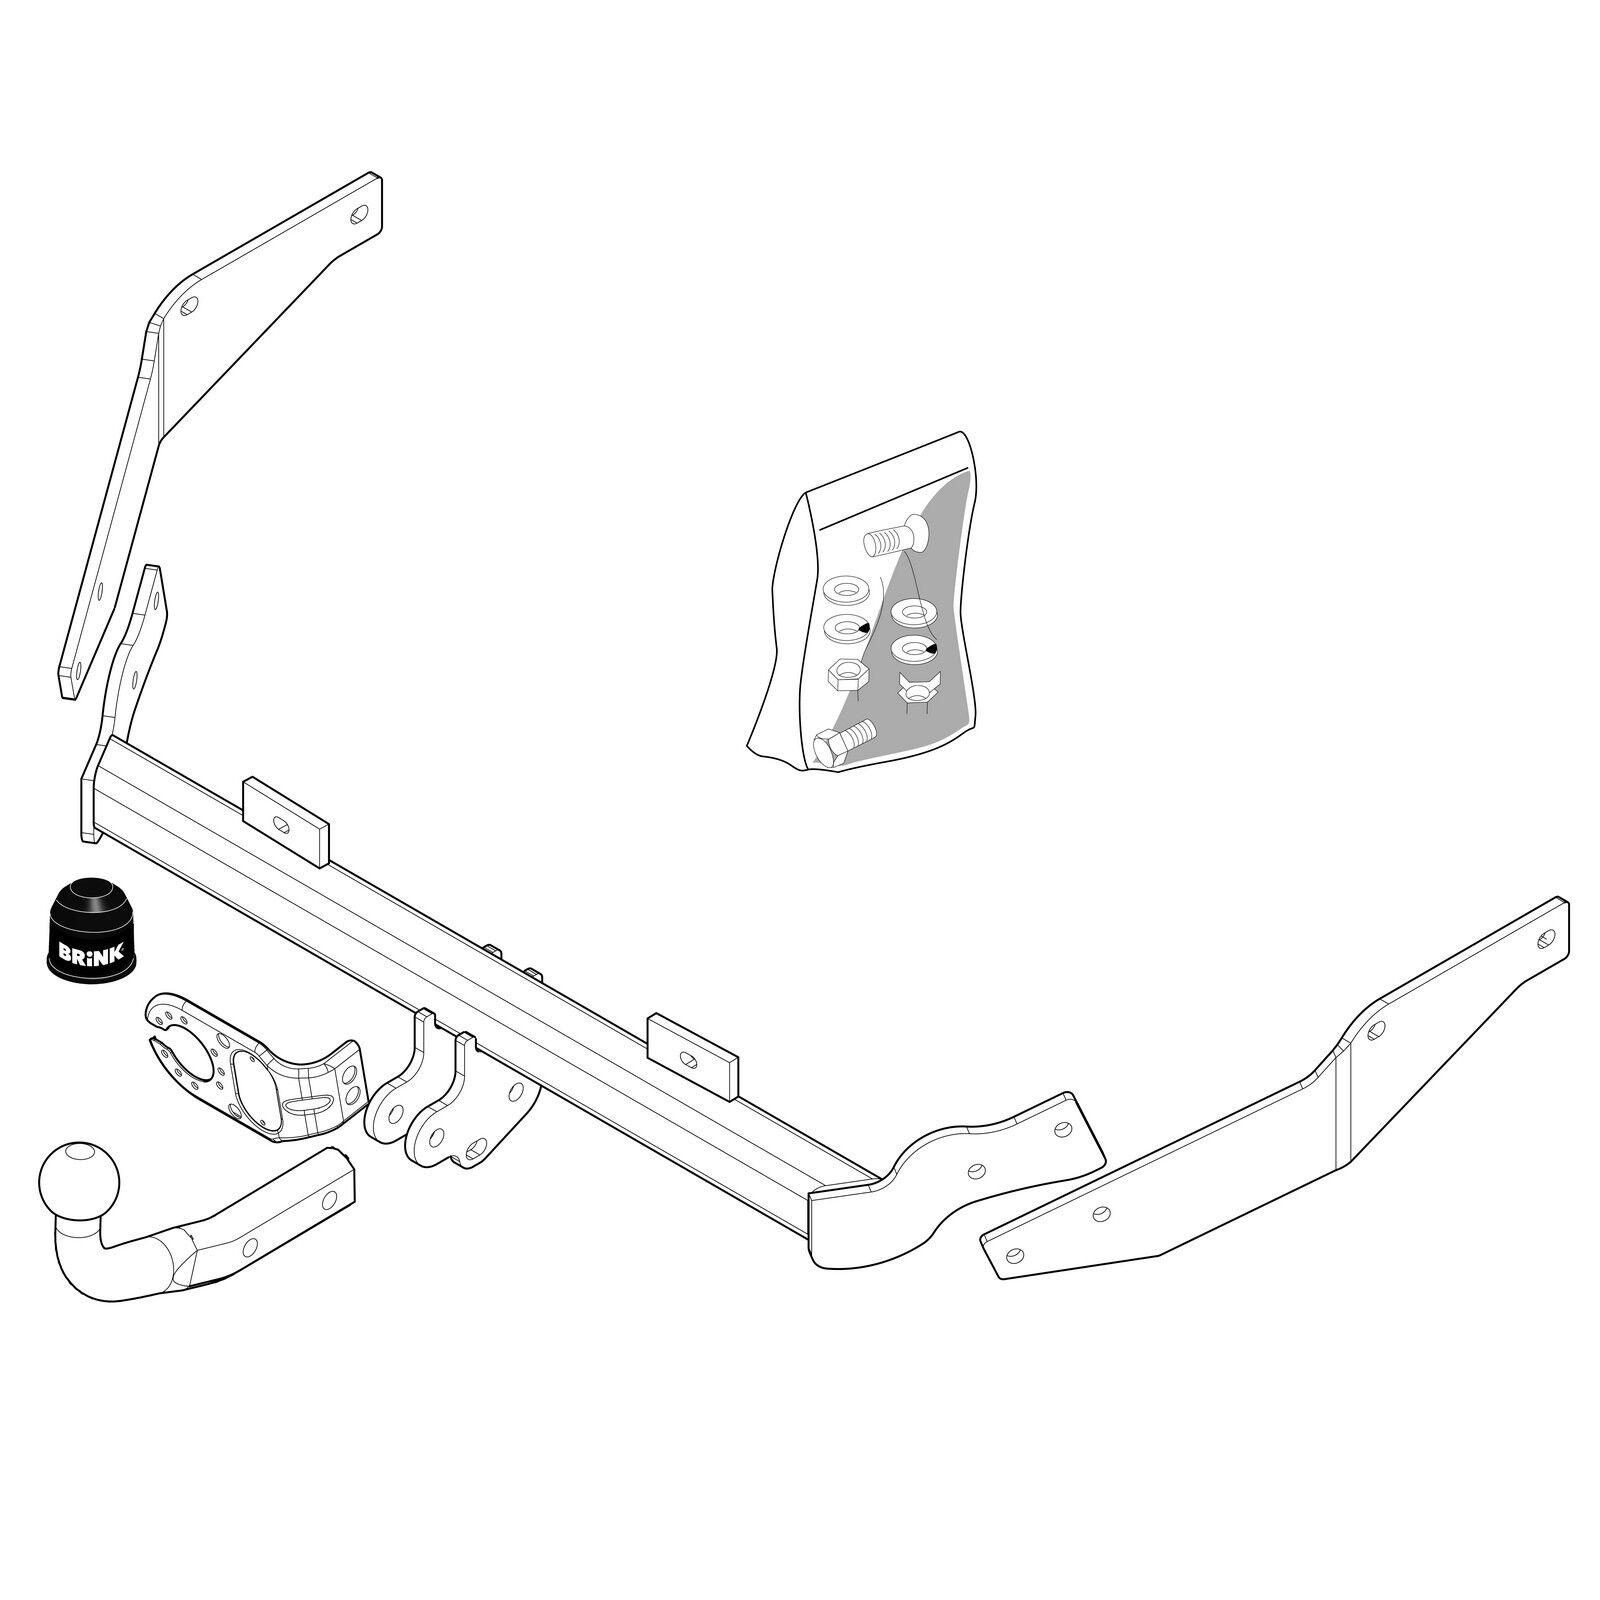 Peugeot Partner Towbar Wiring Diagram - Catalogue of Schemas on